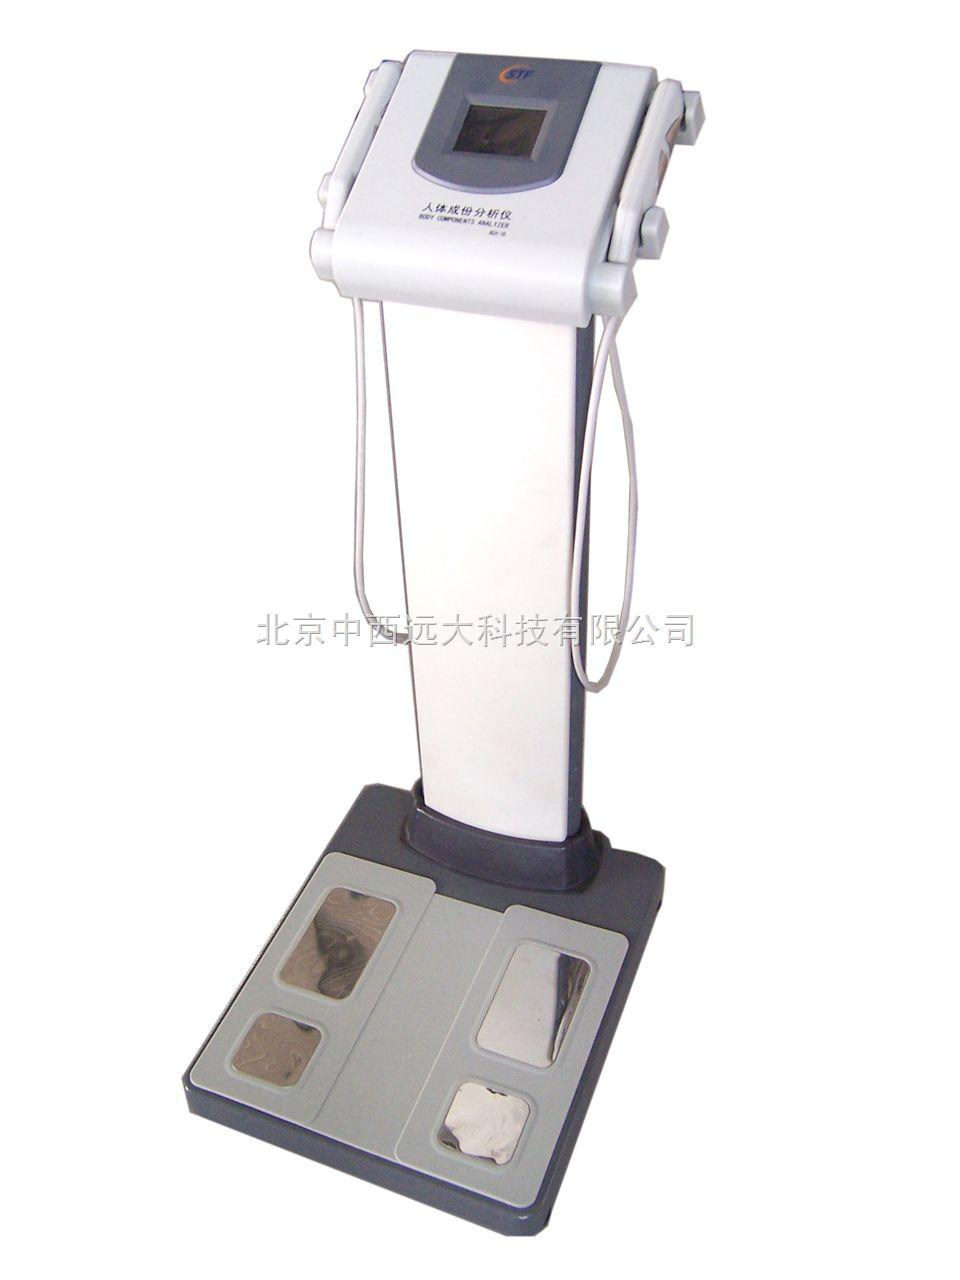 m311671-人体成份分析仪(国产)-北京中西集团